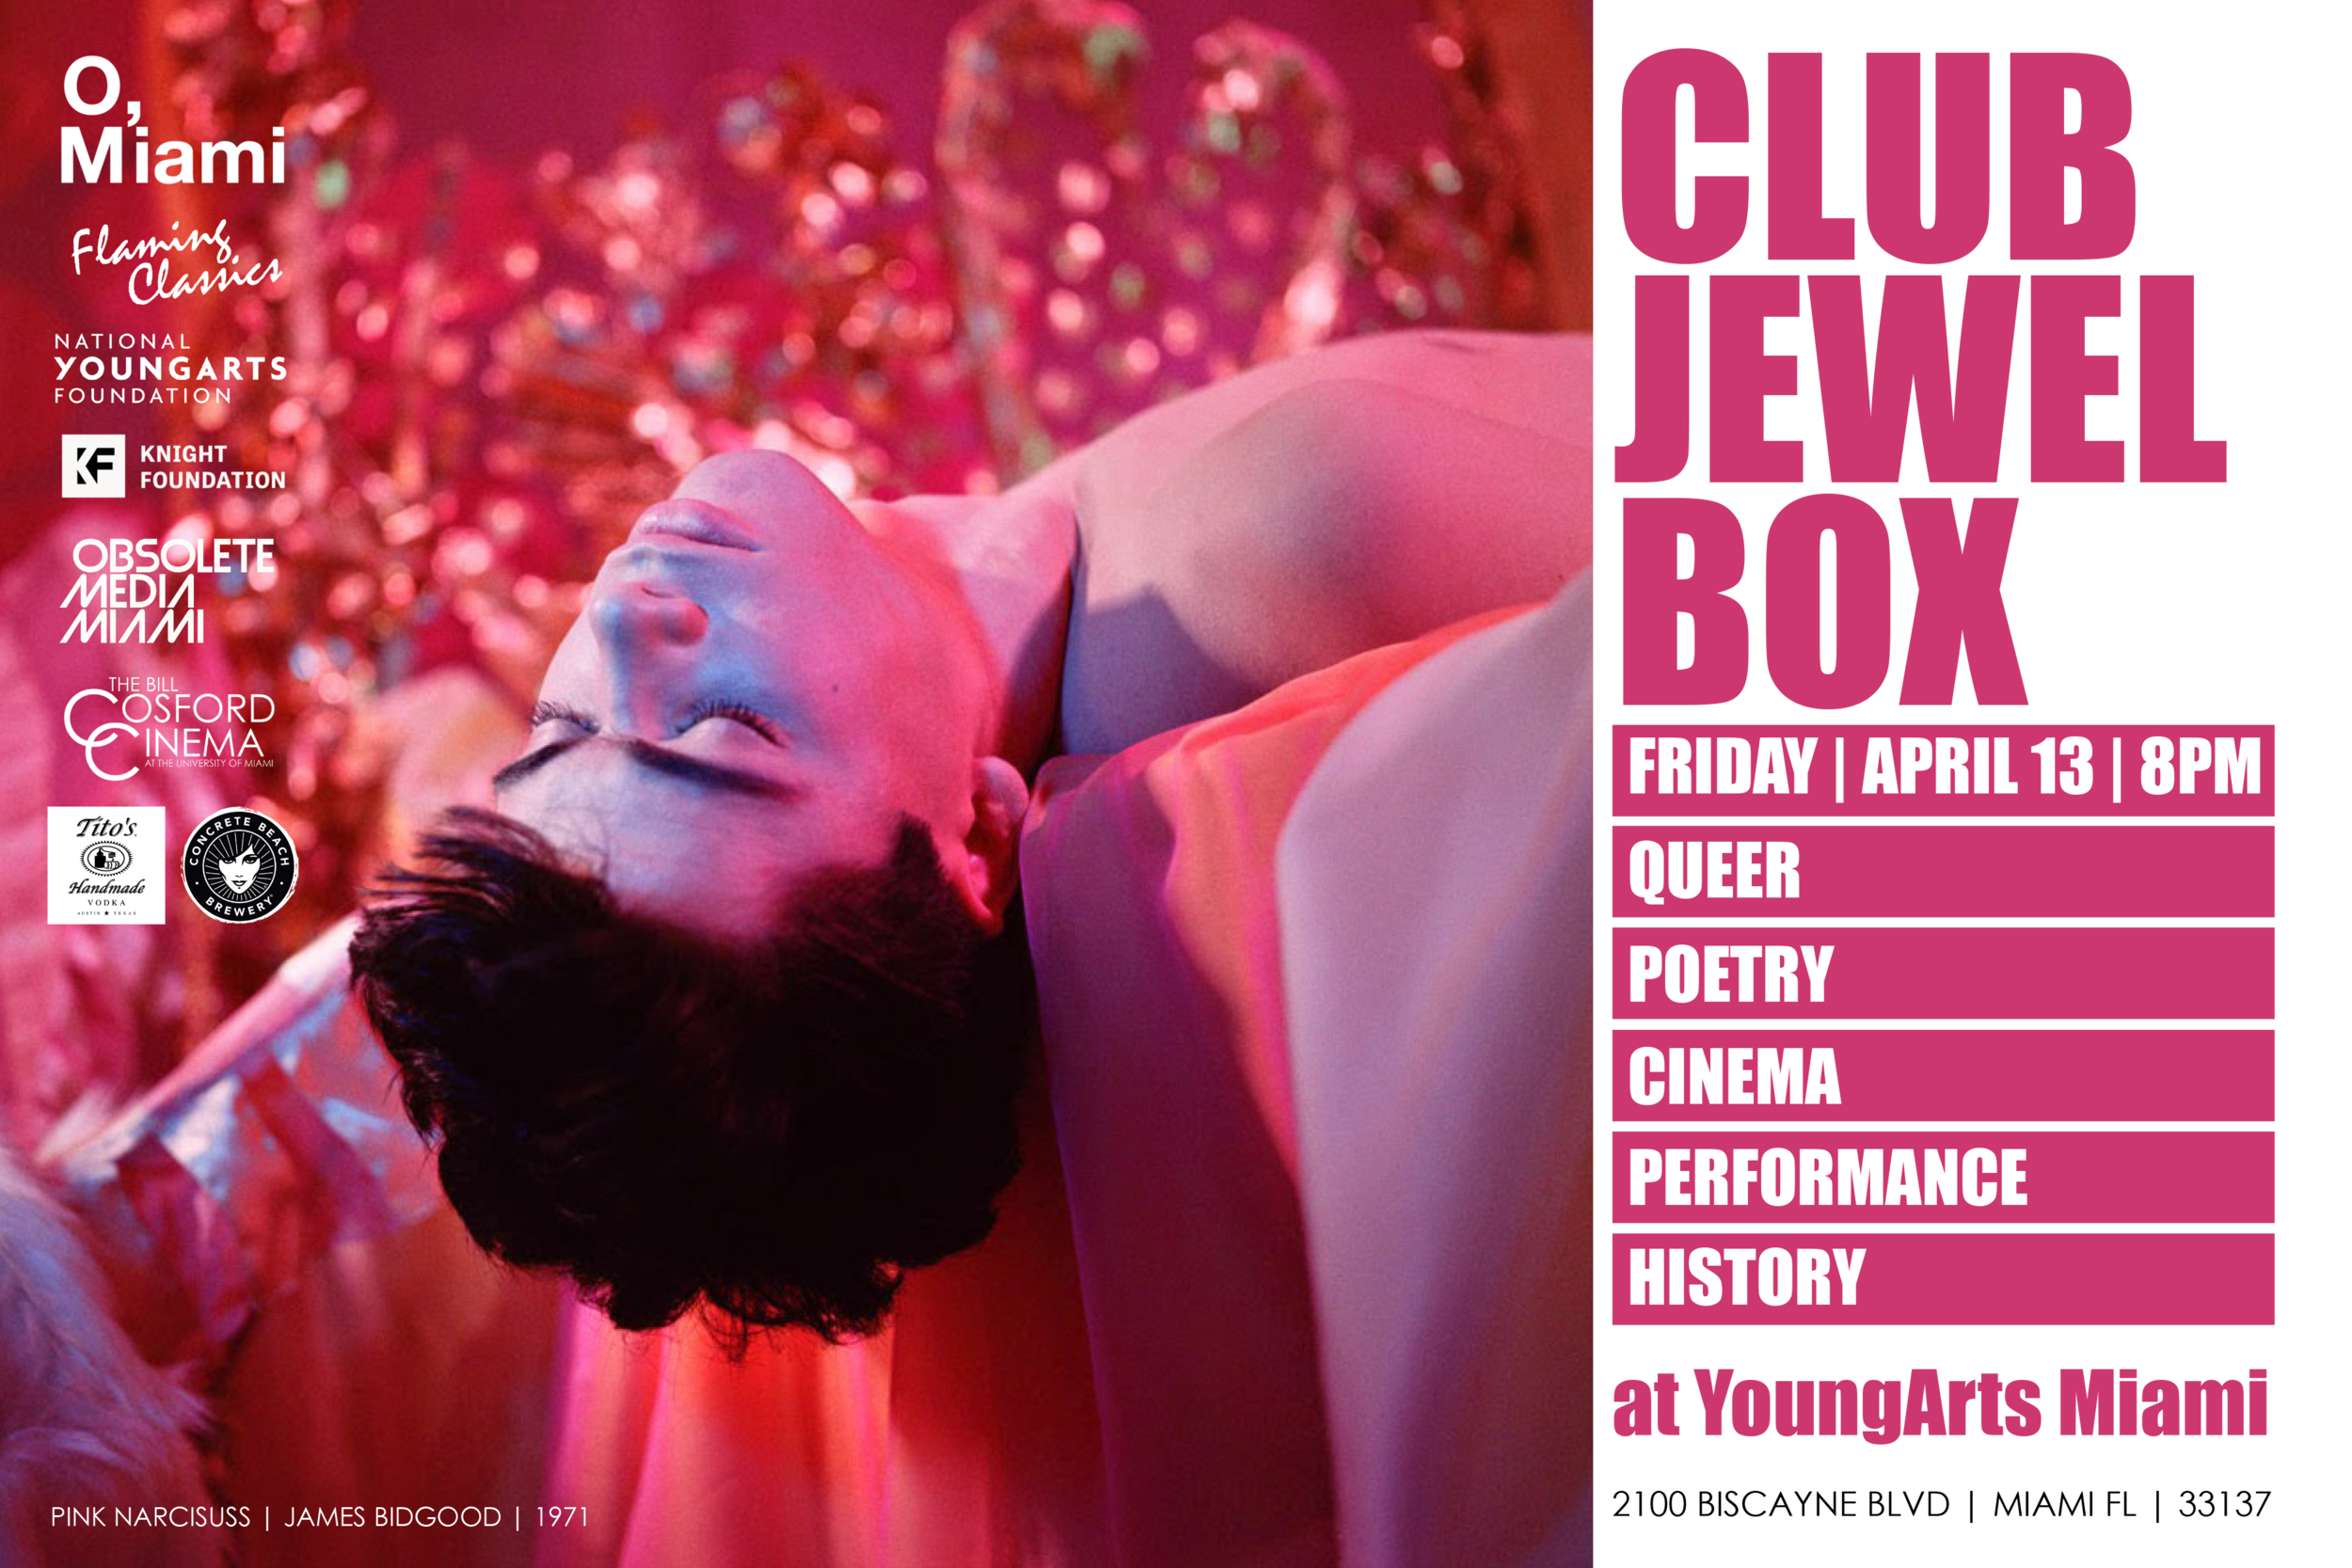 CLUB JEWEL BOX PROMO 2.png